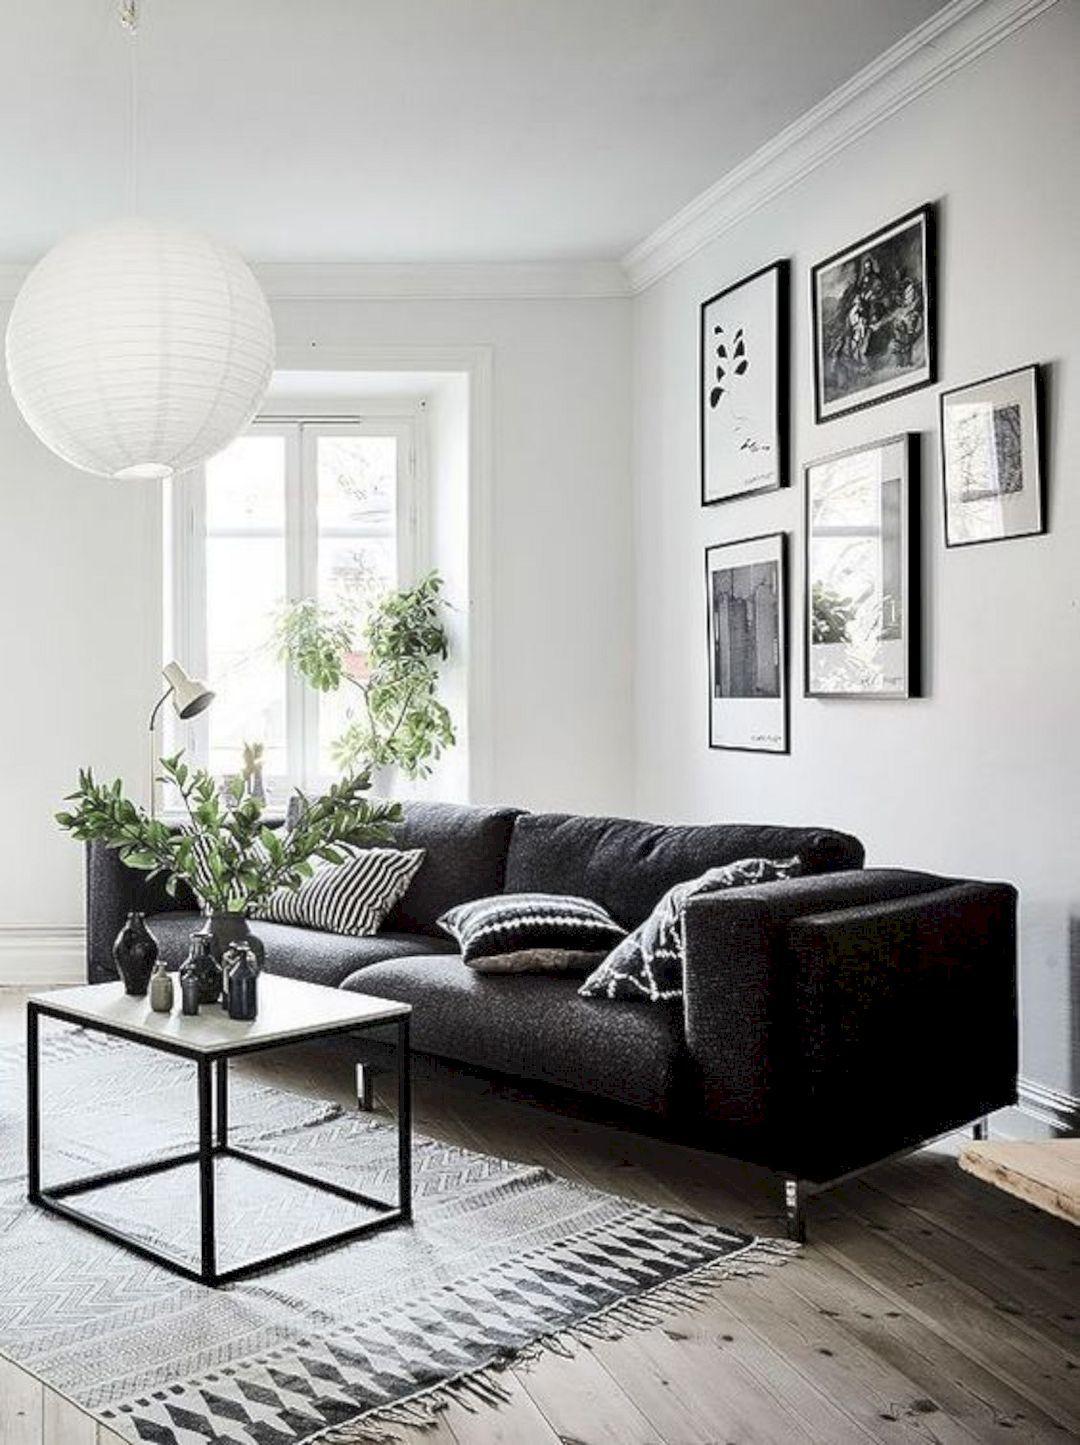 3 Contemporary Room Decoration Ideas White Living Room Decor Gray Living Room Design Living Room Grey